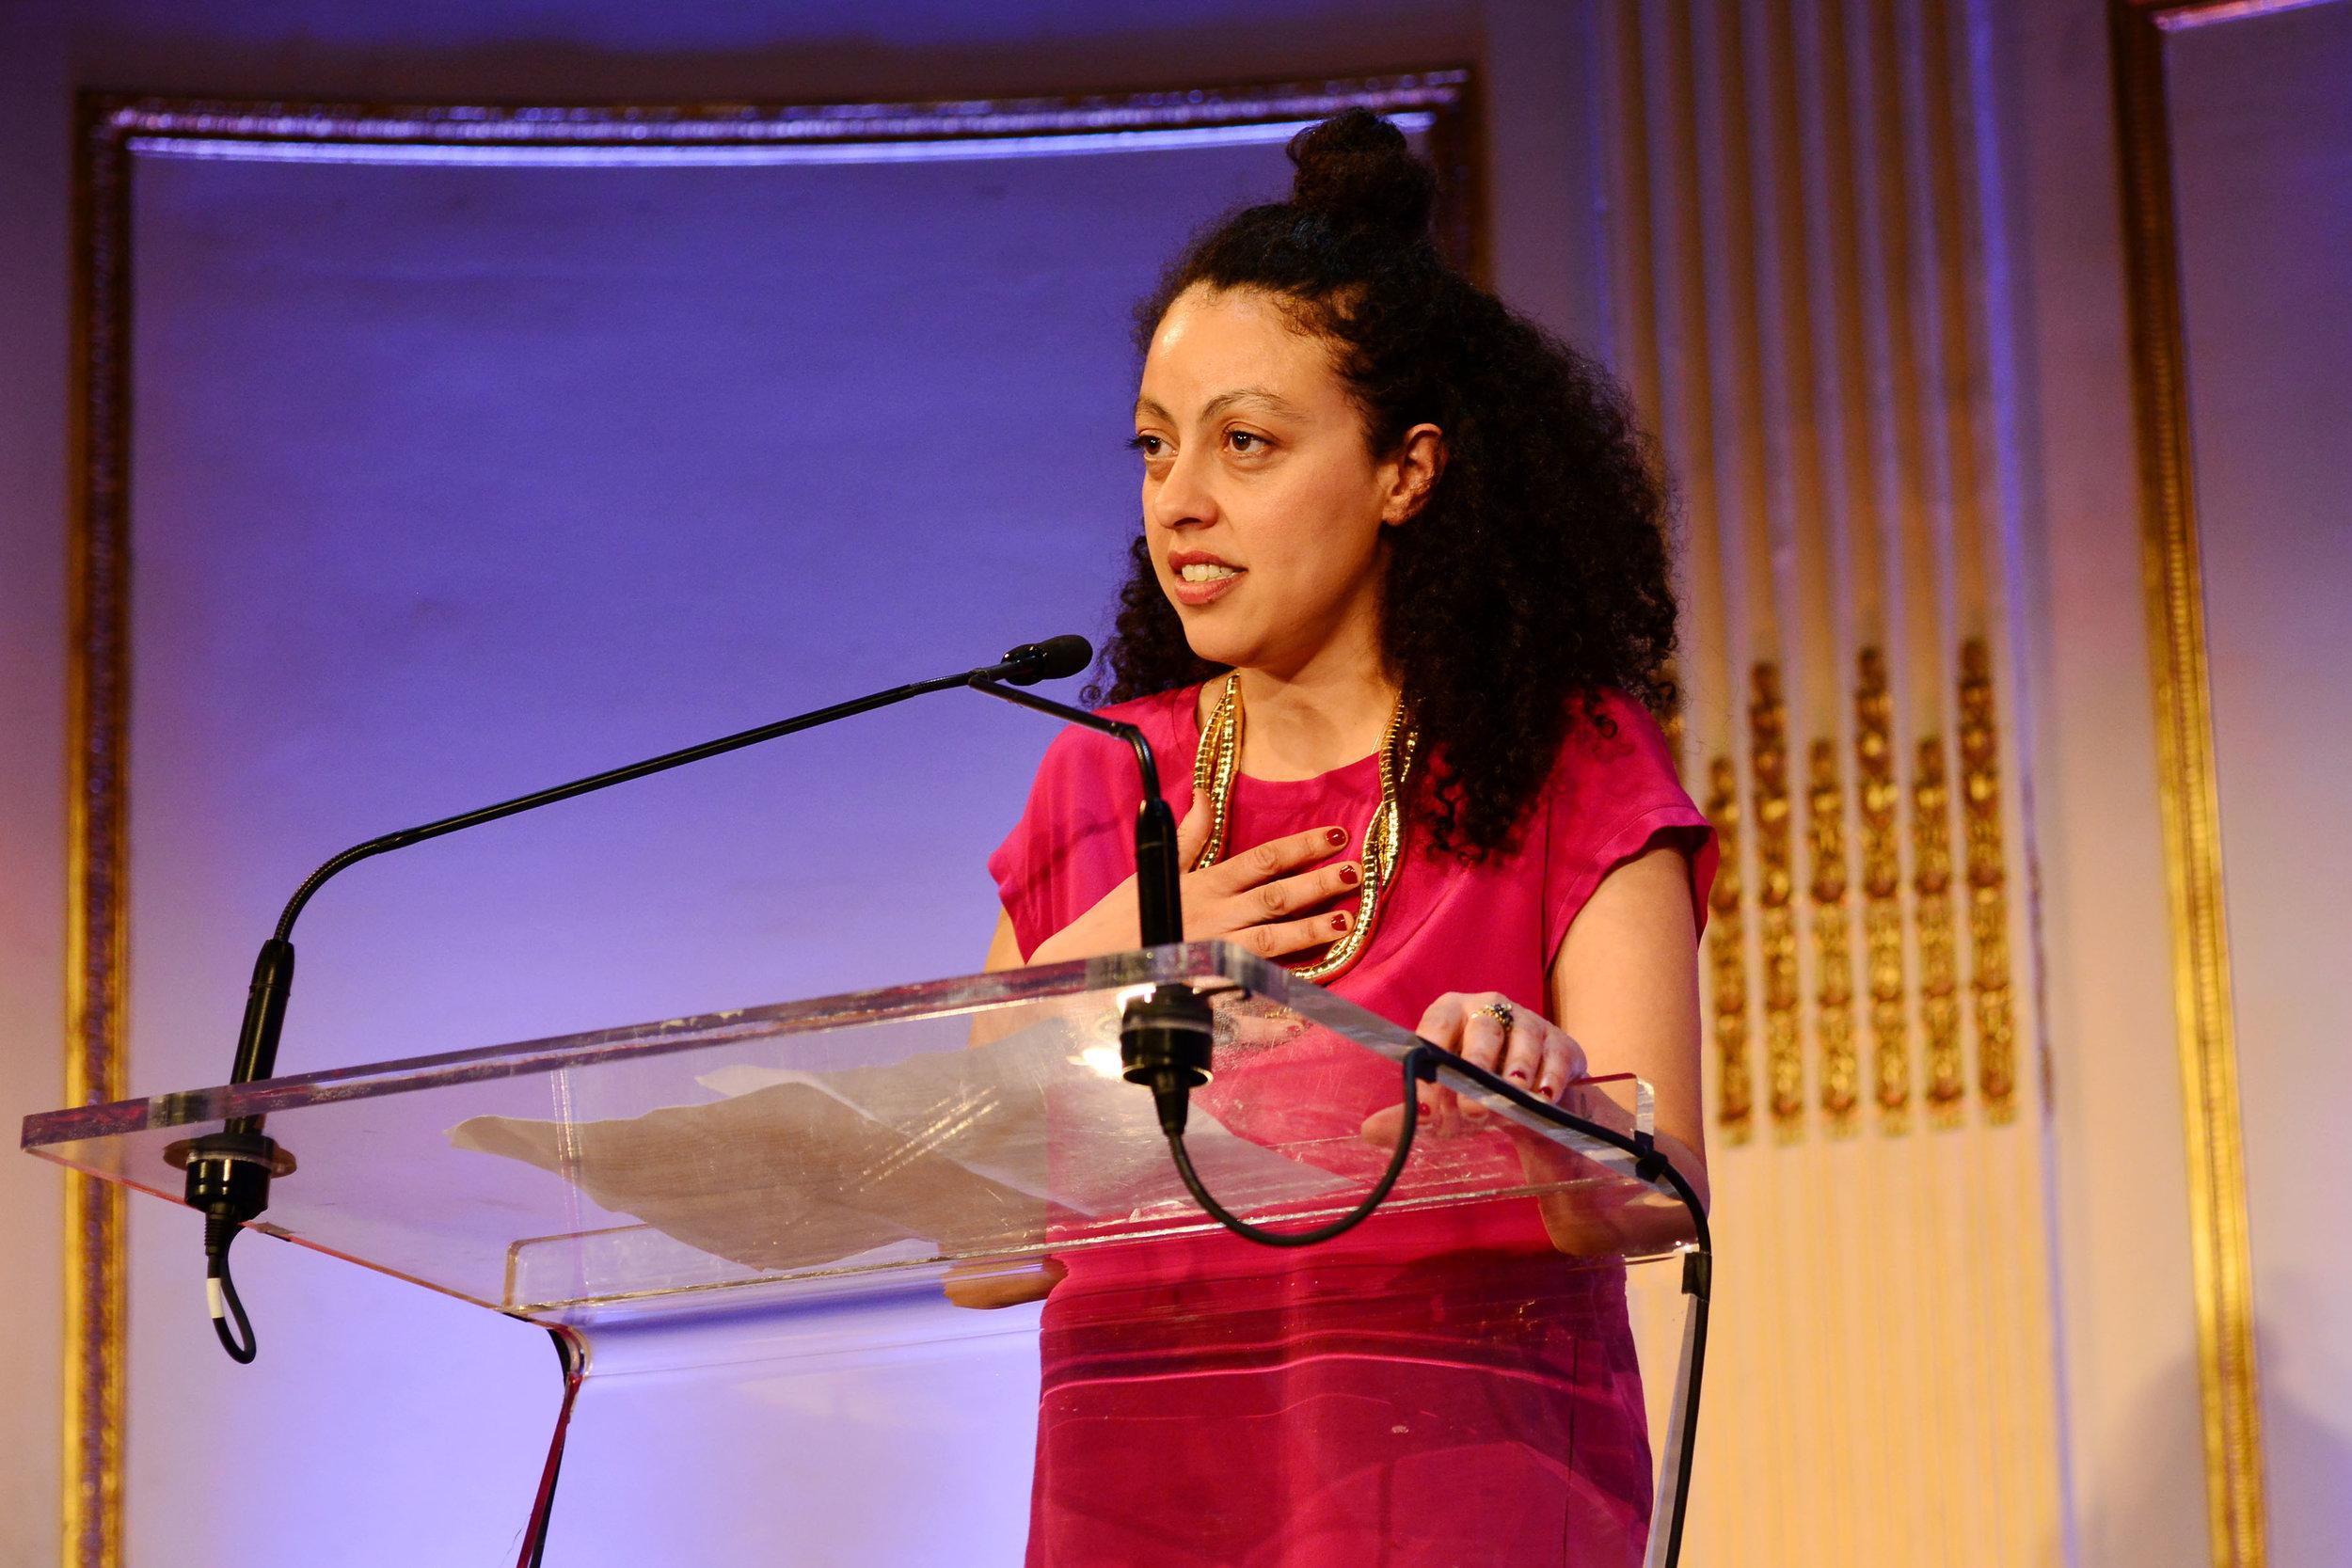 Sarah Workneh==Skowhegan 70th Anniversary Celebration & 2016 Awards Dinner== The Plaza, NYC==April 26, 2016==©Patrick McMullan==Photo – Jared Siskin/PMC==